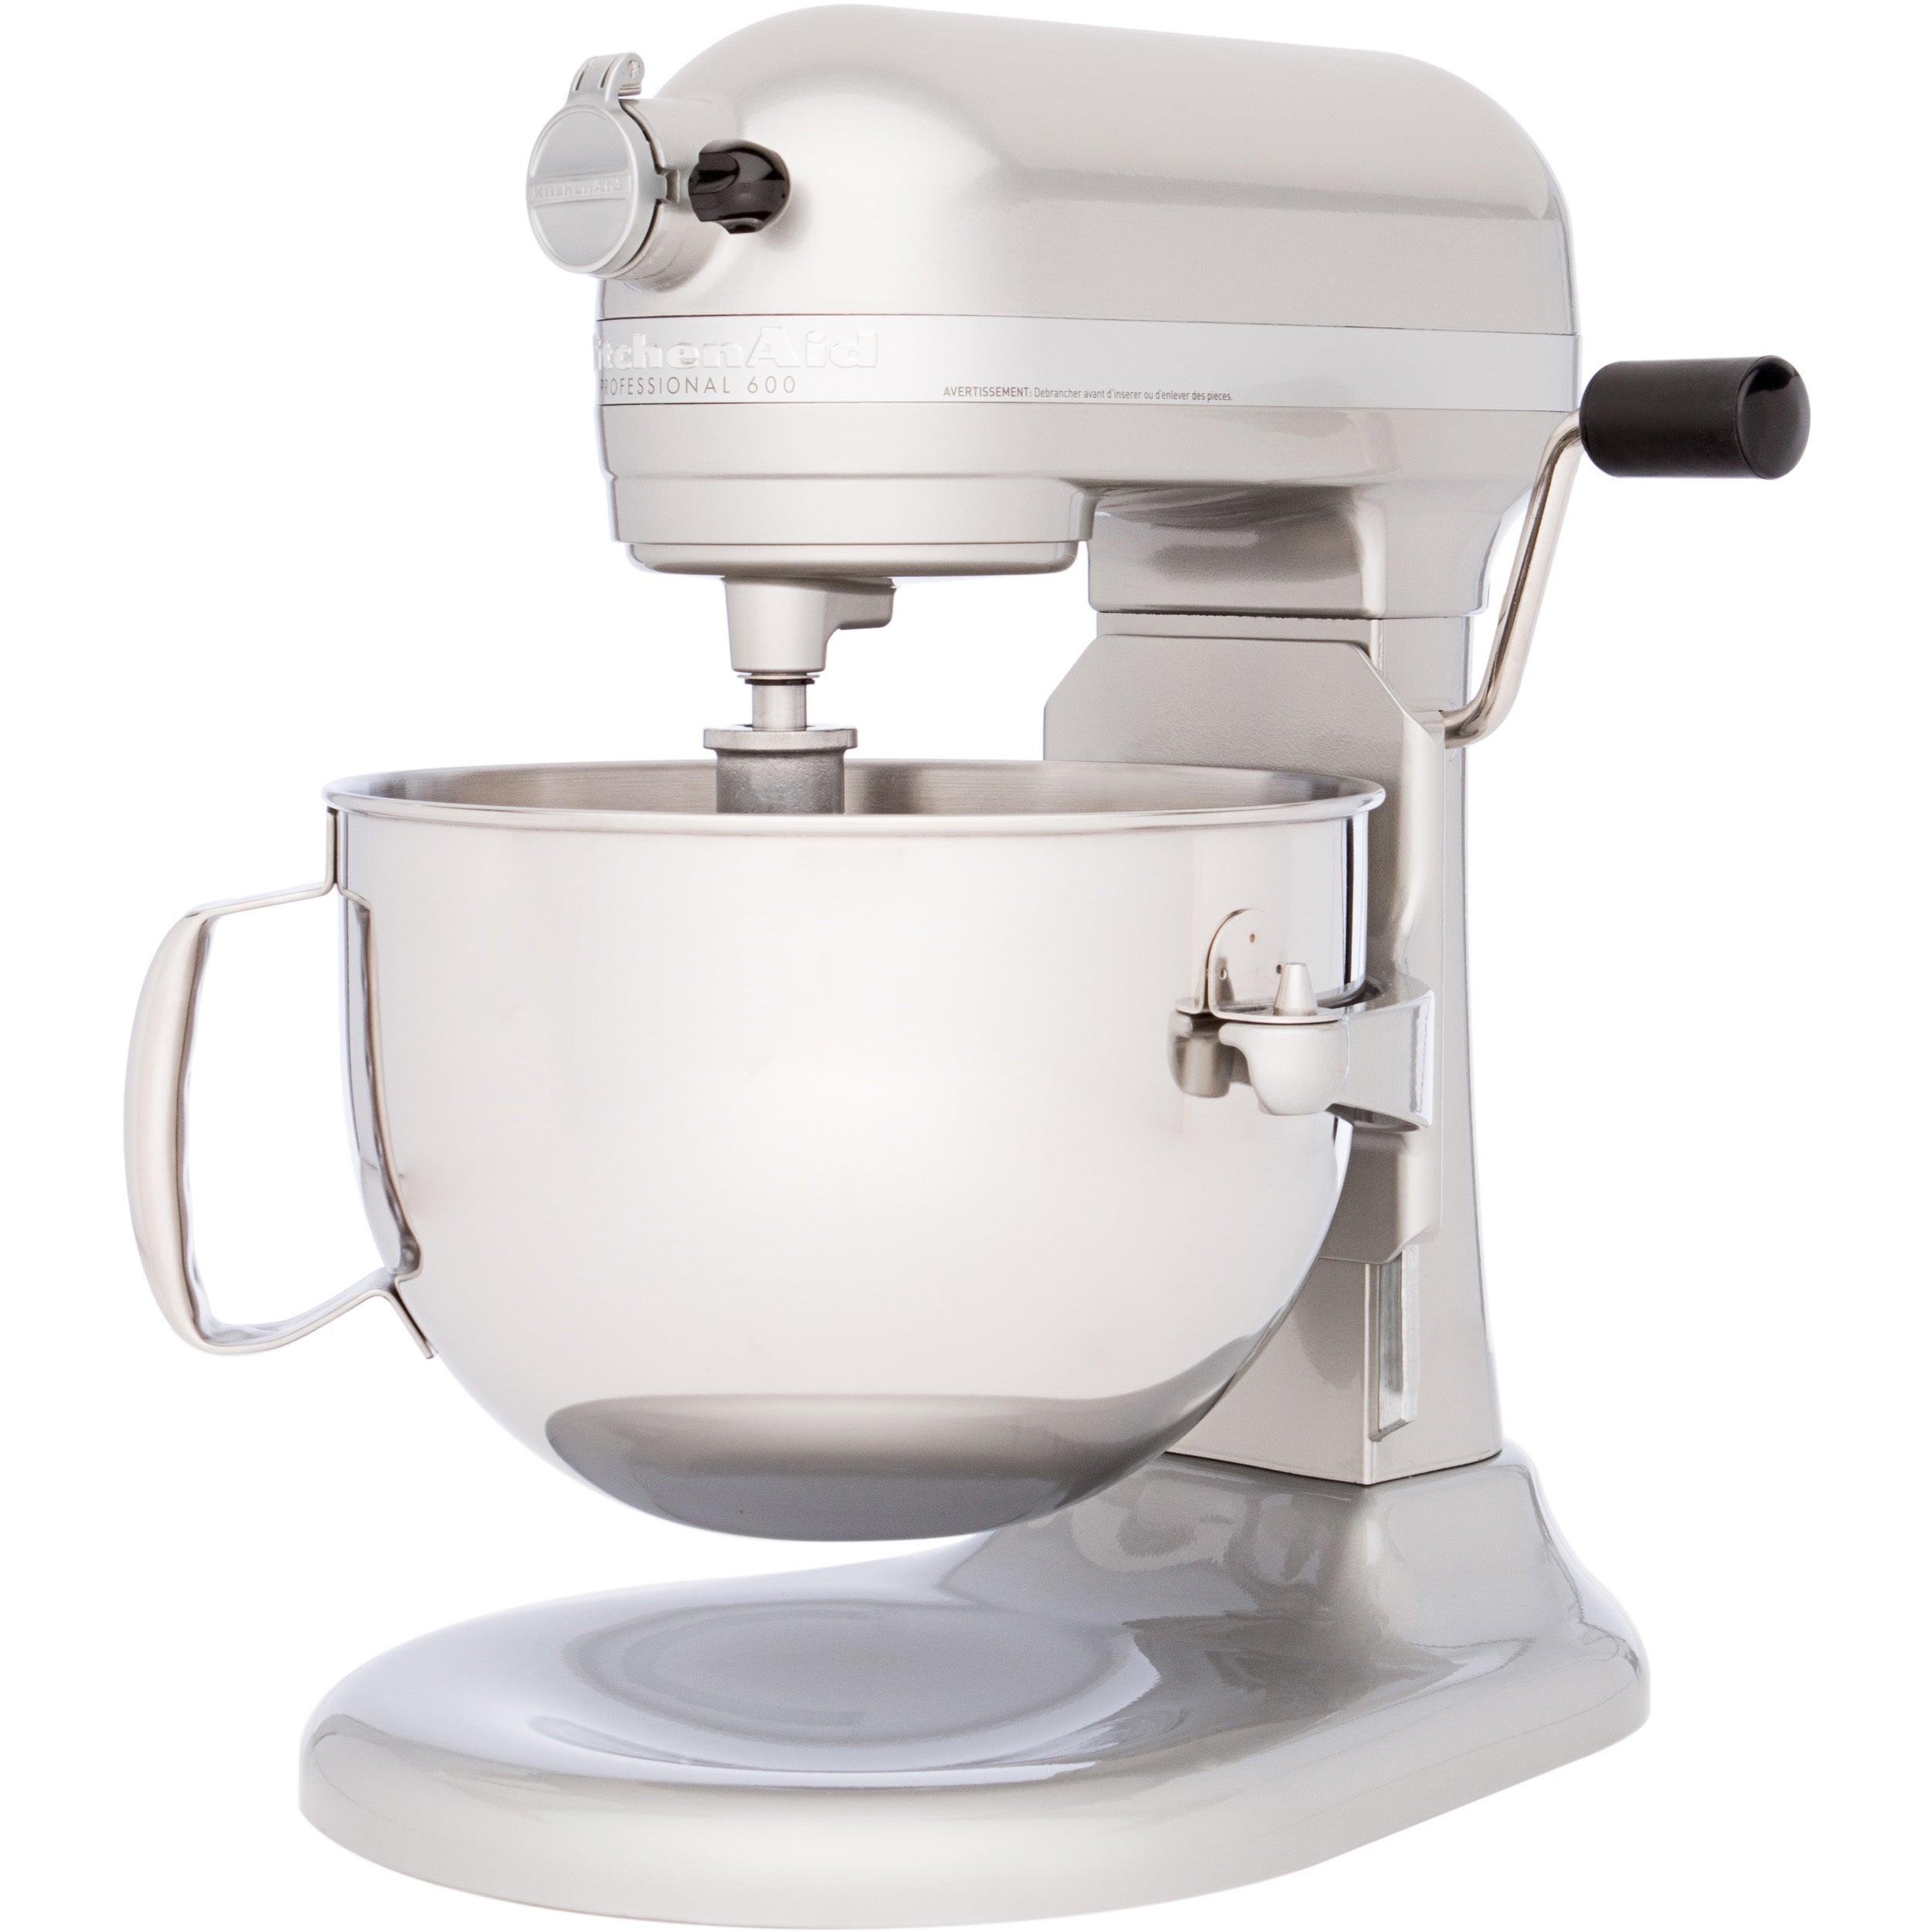 Top Product Reviews for KitchenAid RKP26M1XSR Sugar Pearl 6-Quart ...